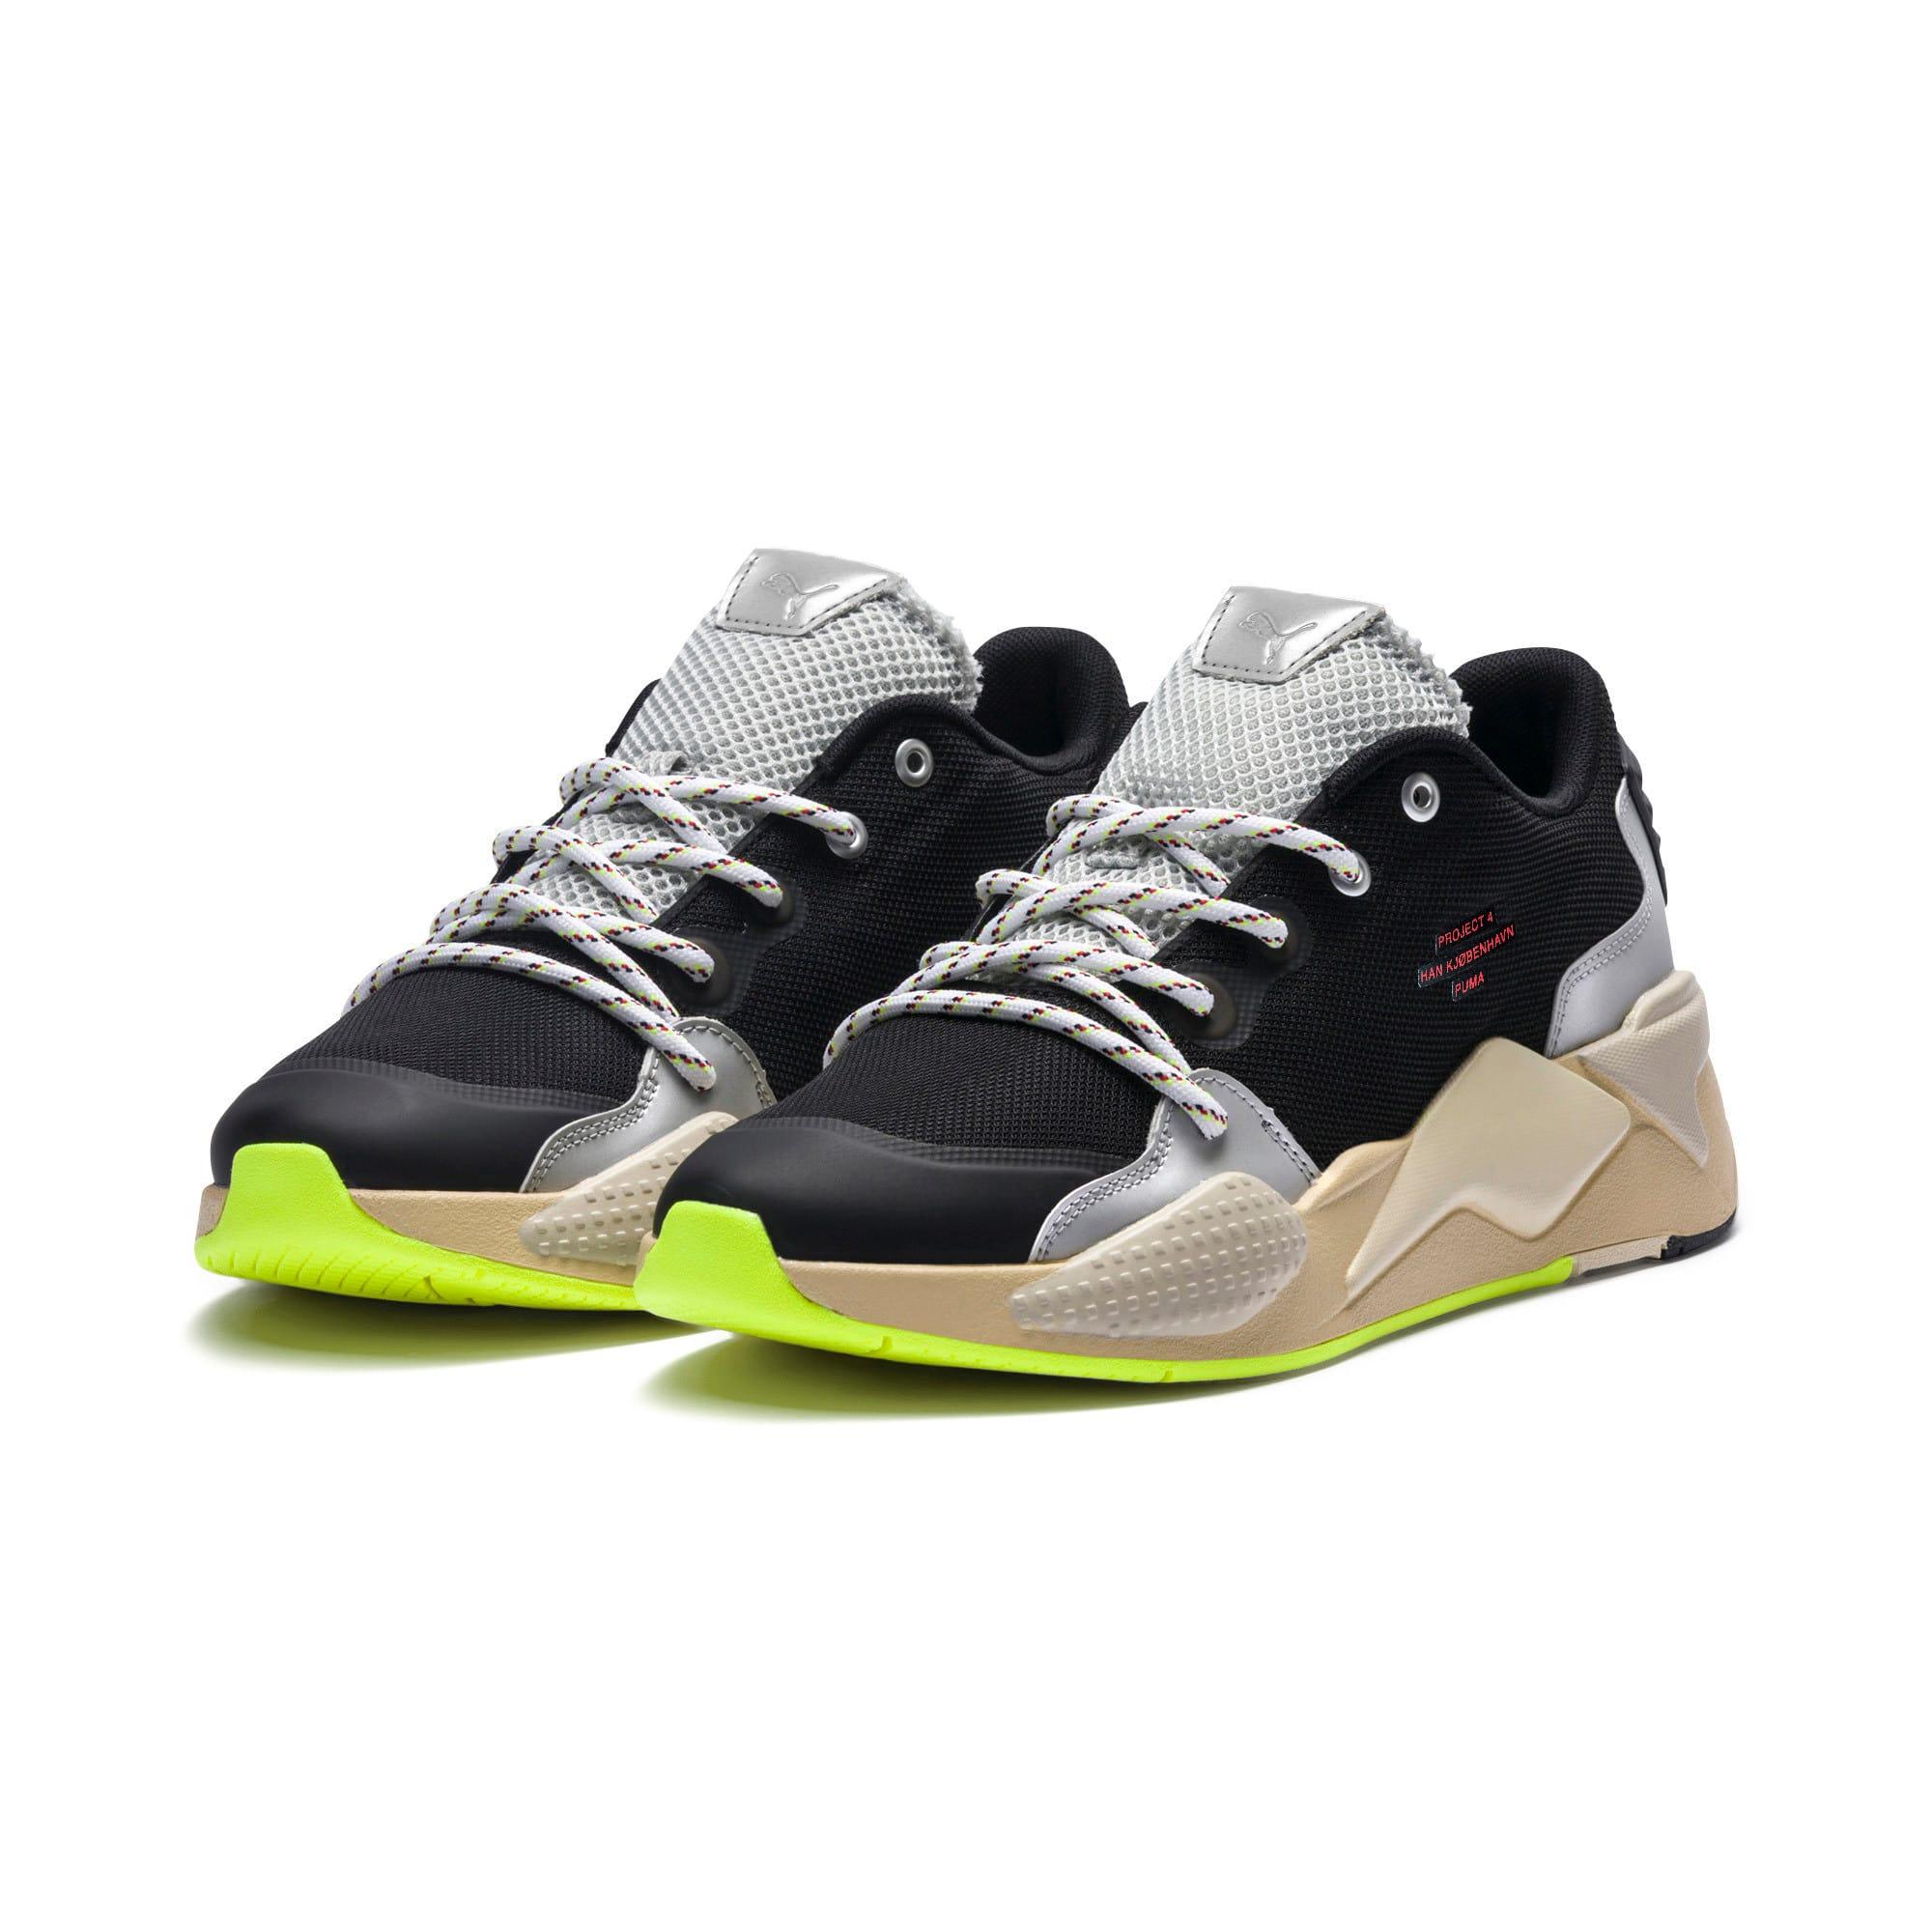 Thumbnail 4 of PUMA x HAN KJØBENHAVN RS-X Sneakers, Puma Black-Puma Silver, medium